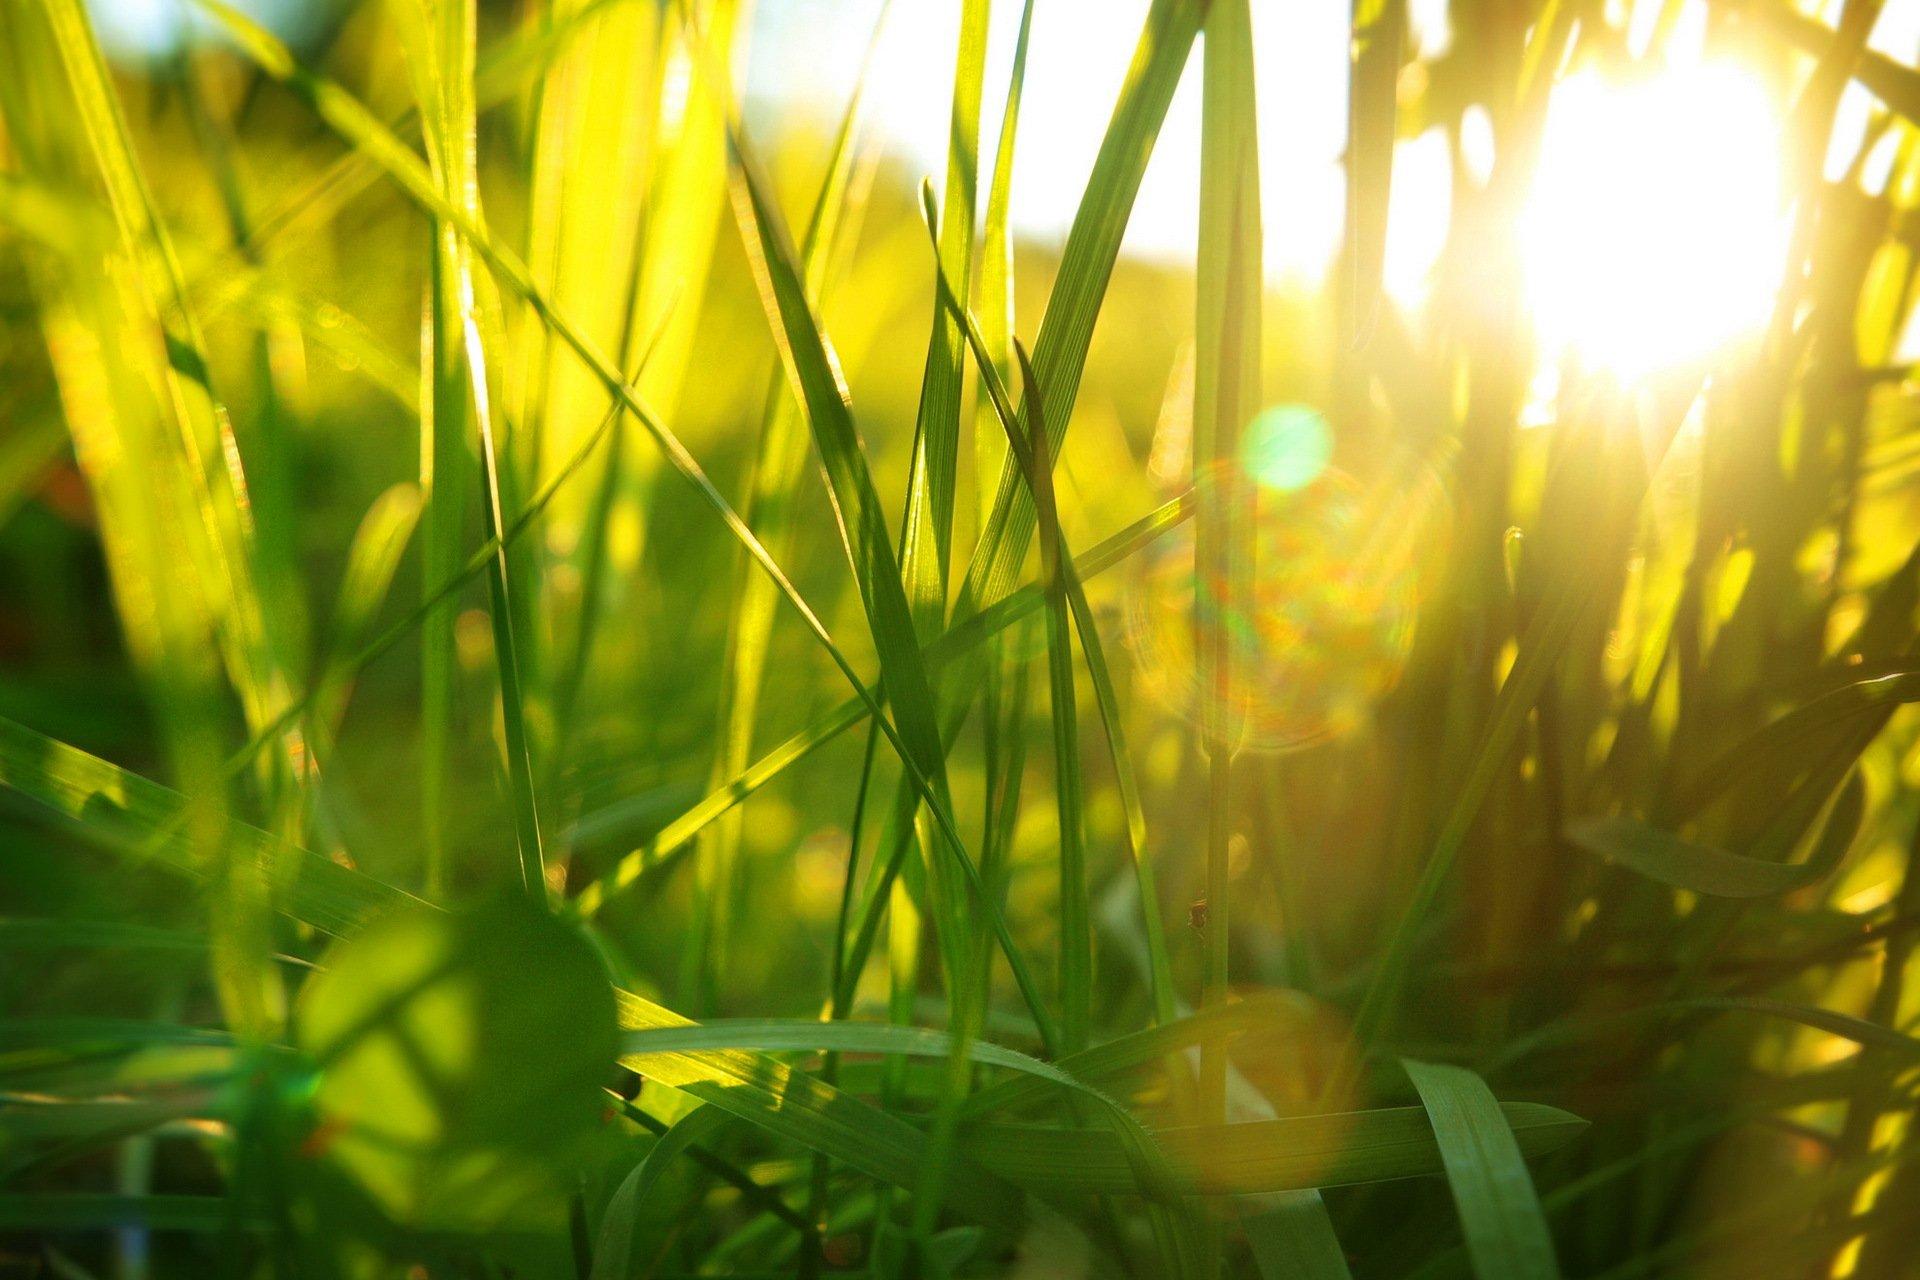 лучи солнца на траве картинки популярные